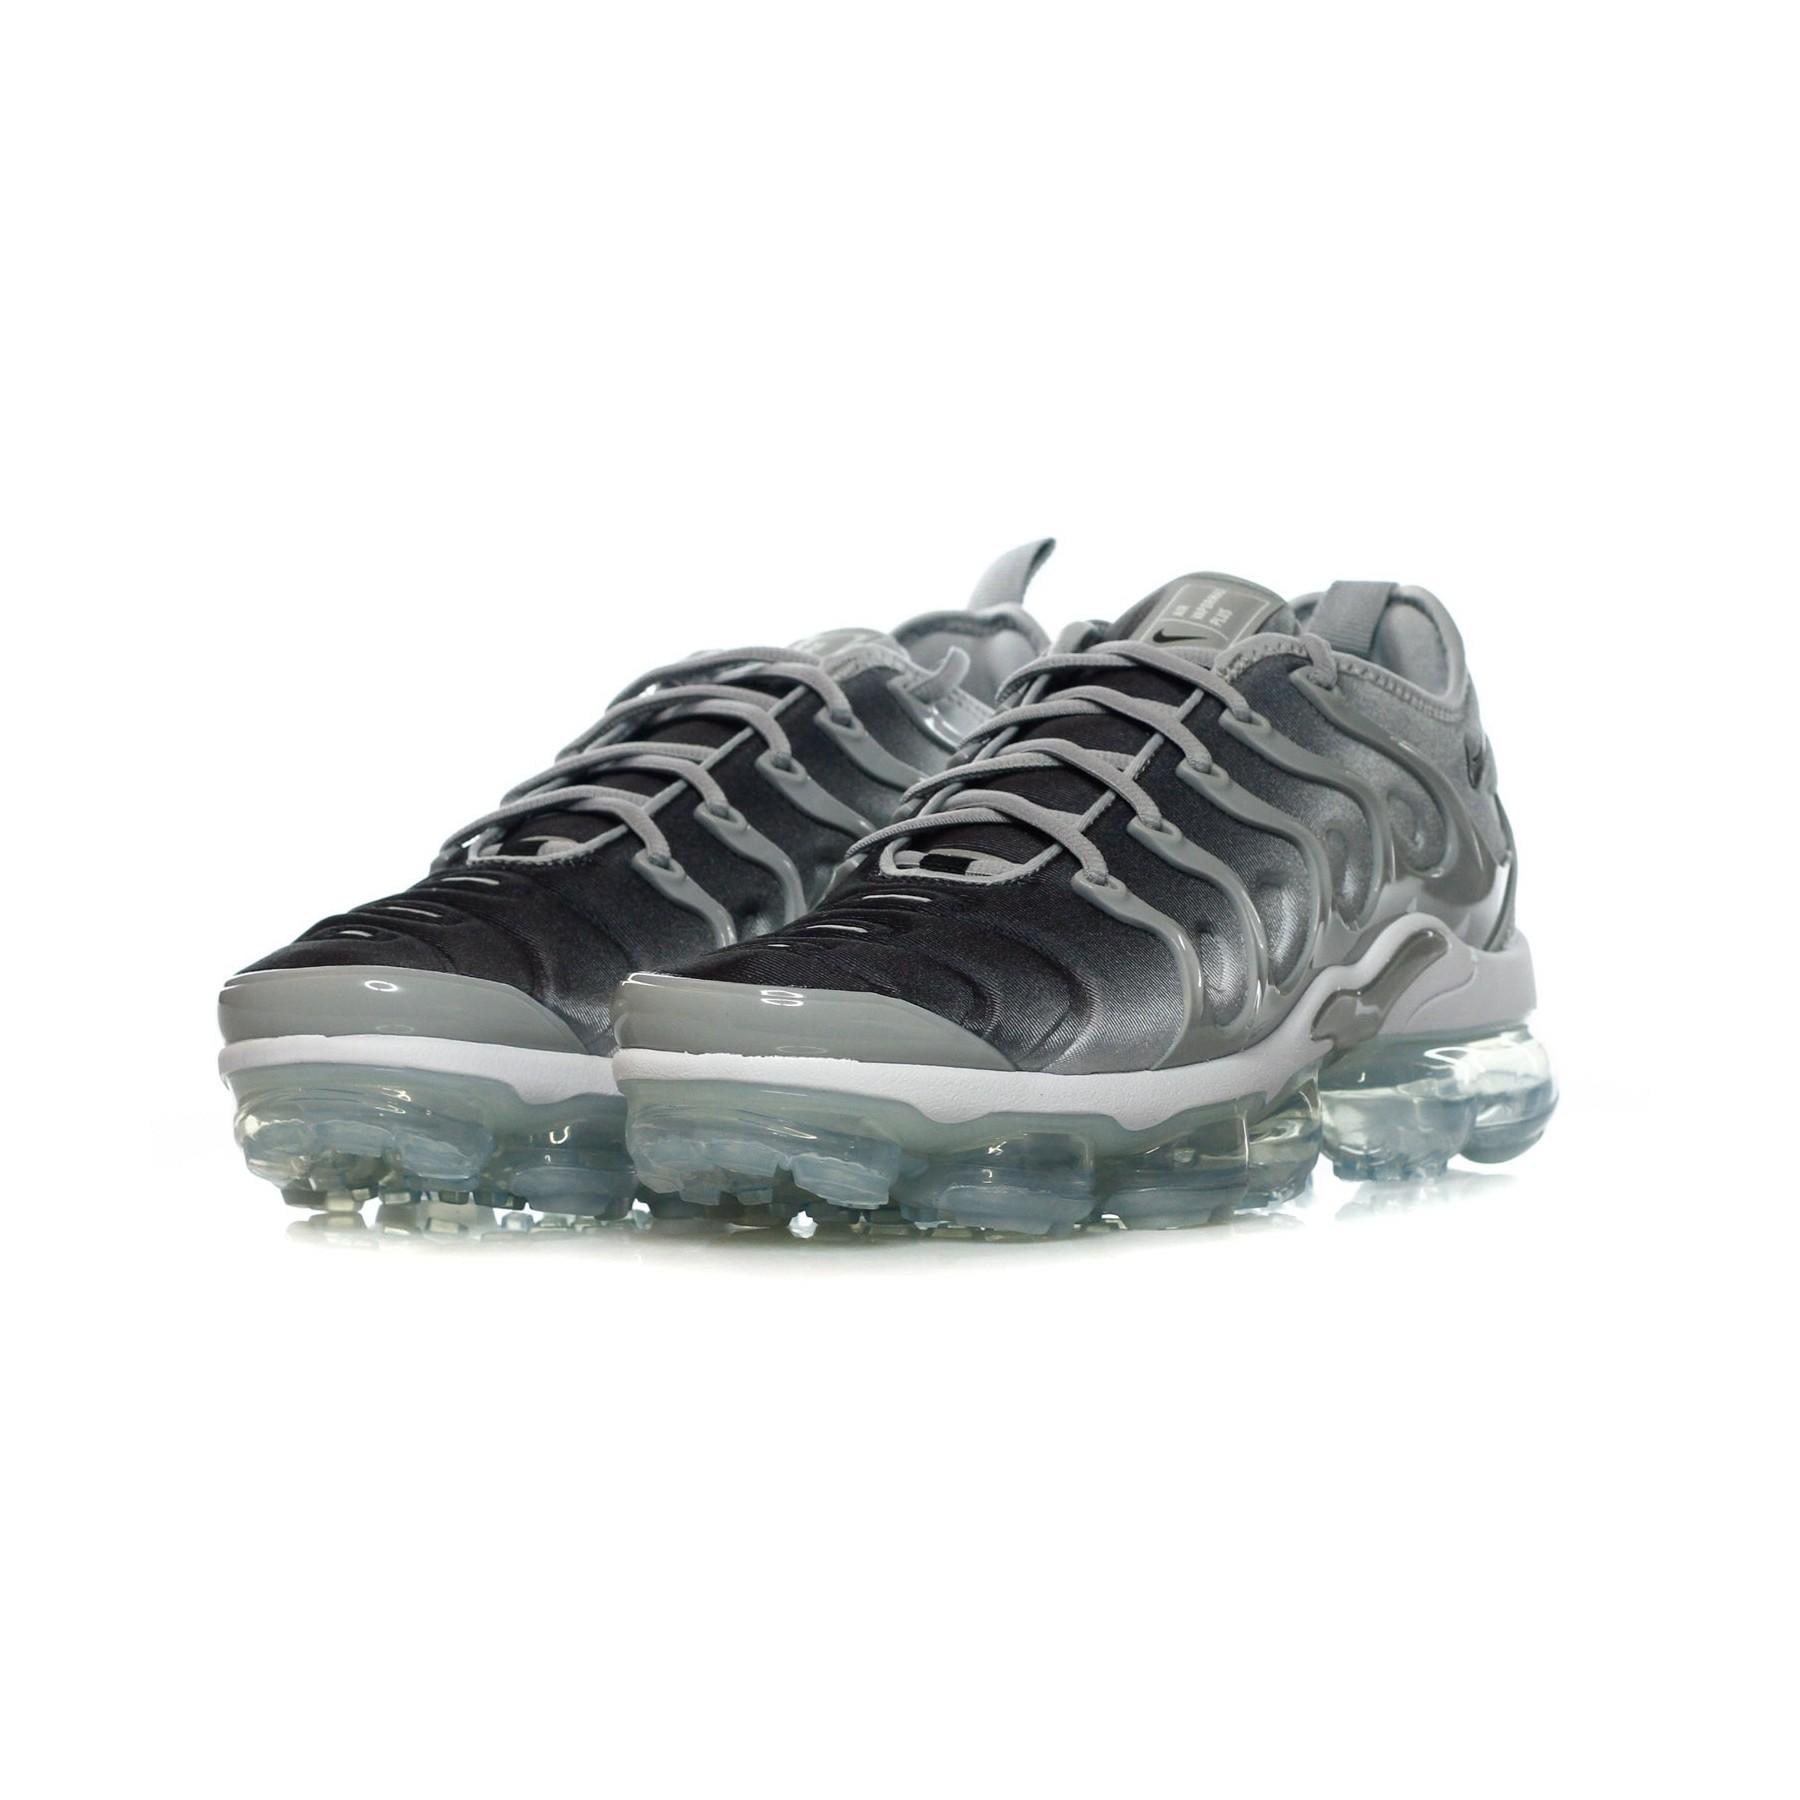 Nike Air Vapormax Plus Wolf Grey Black Dark Grey All Sizes Kixify 384095474